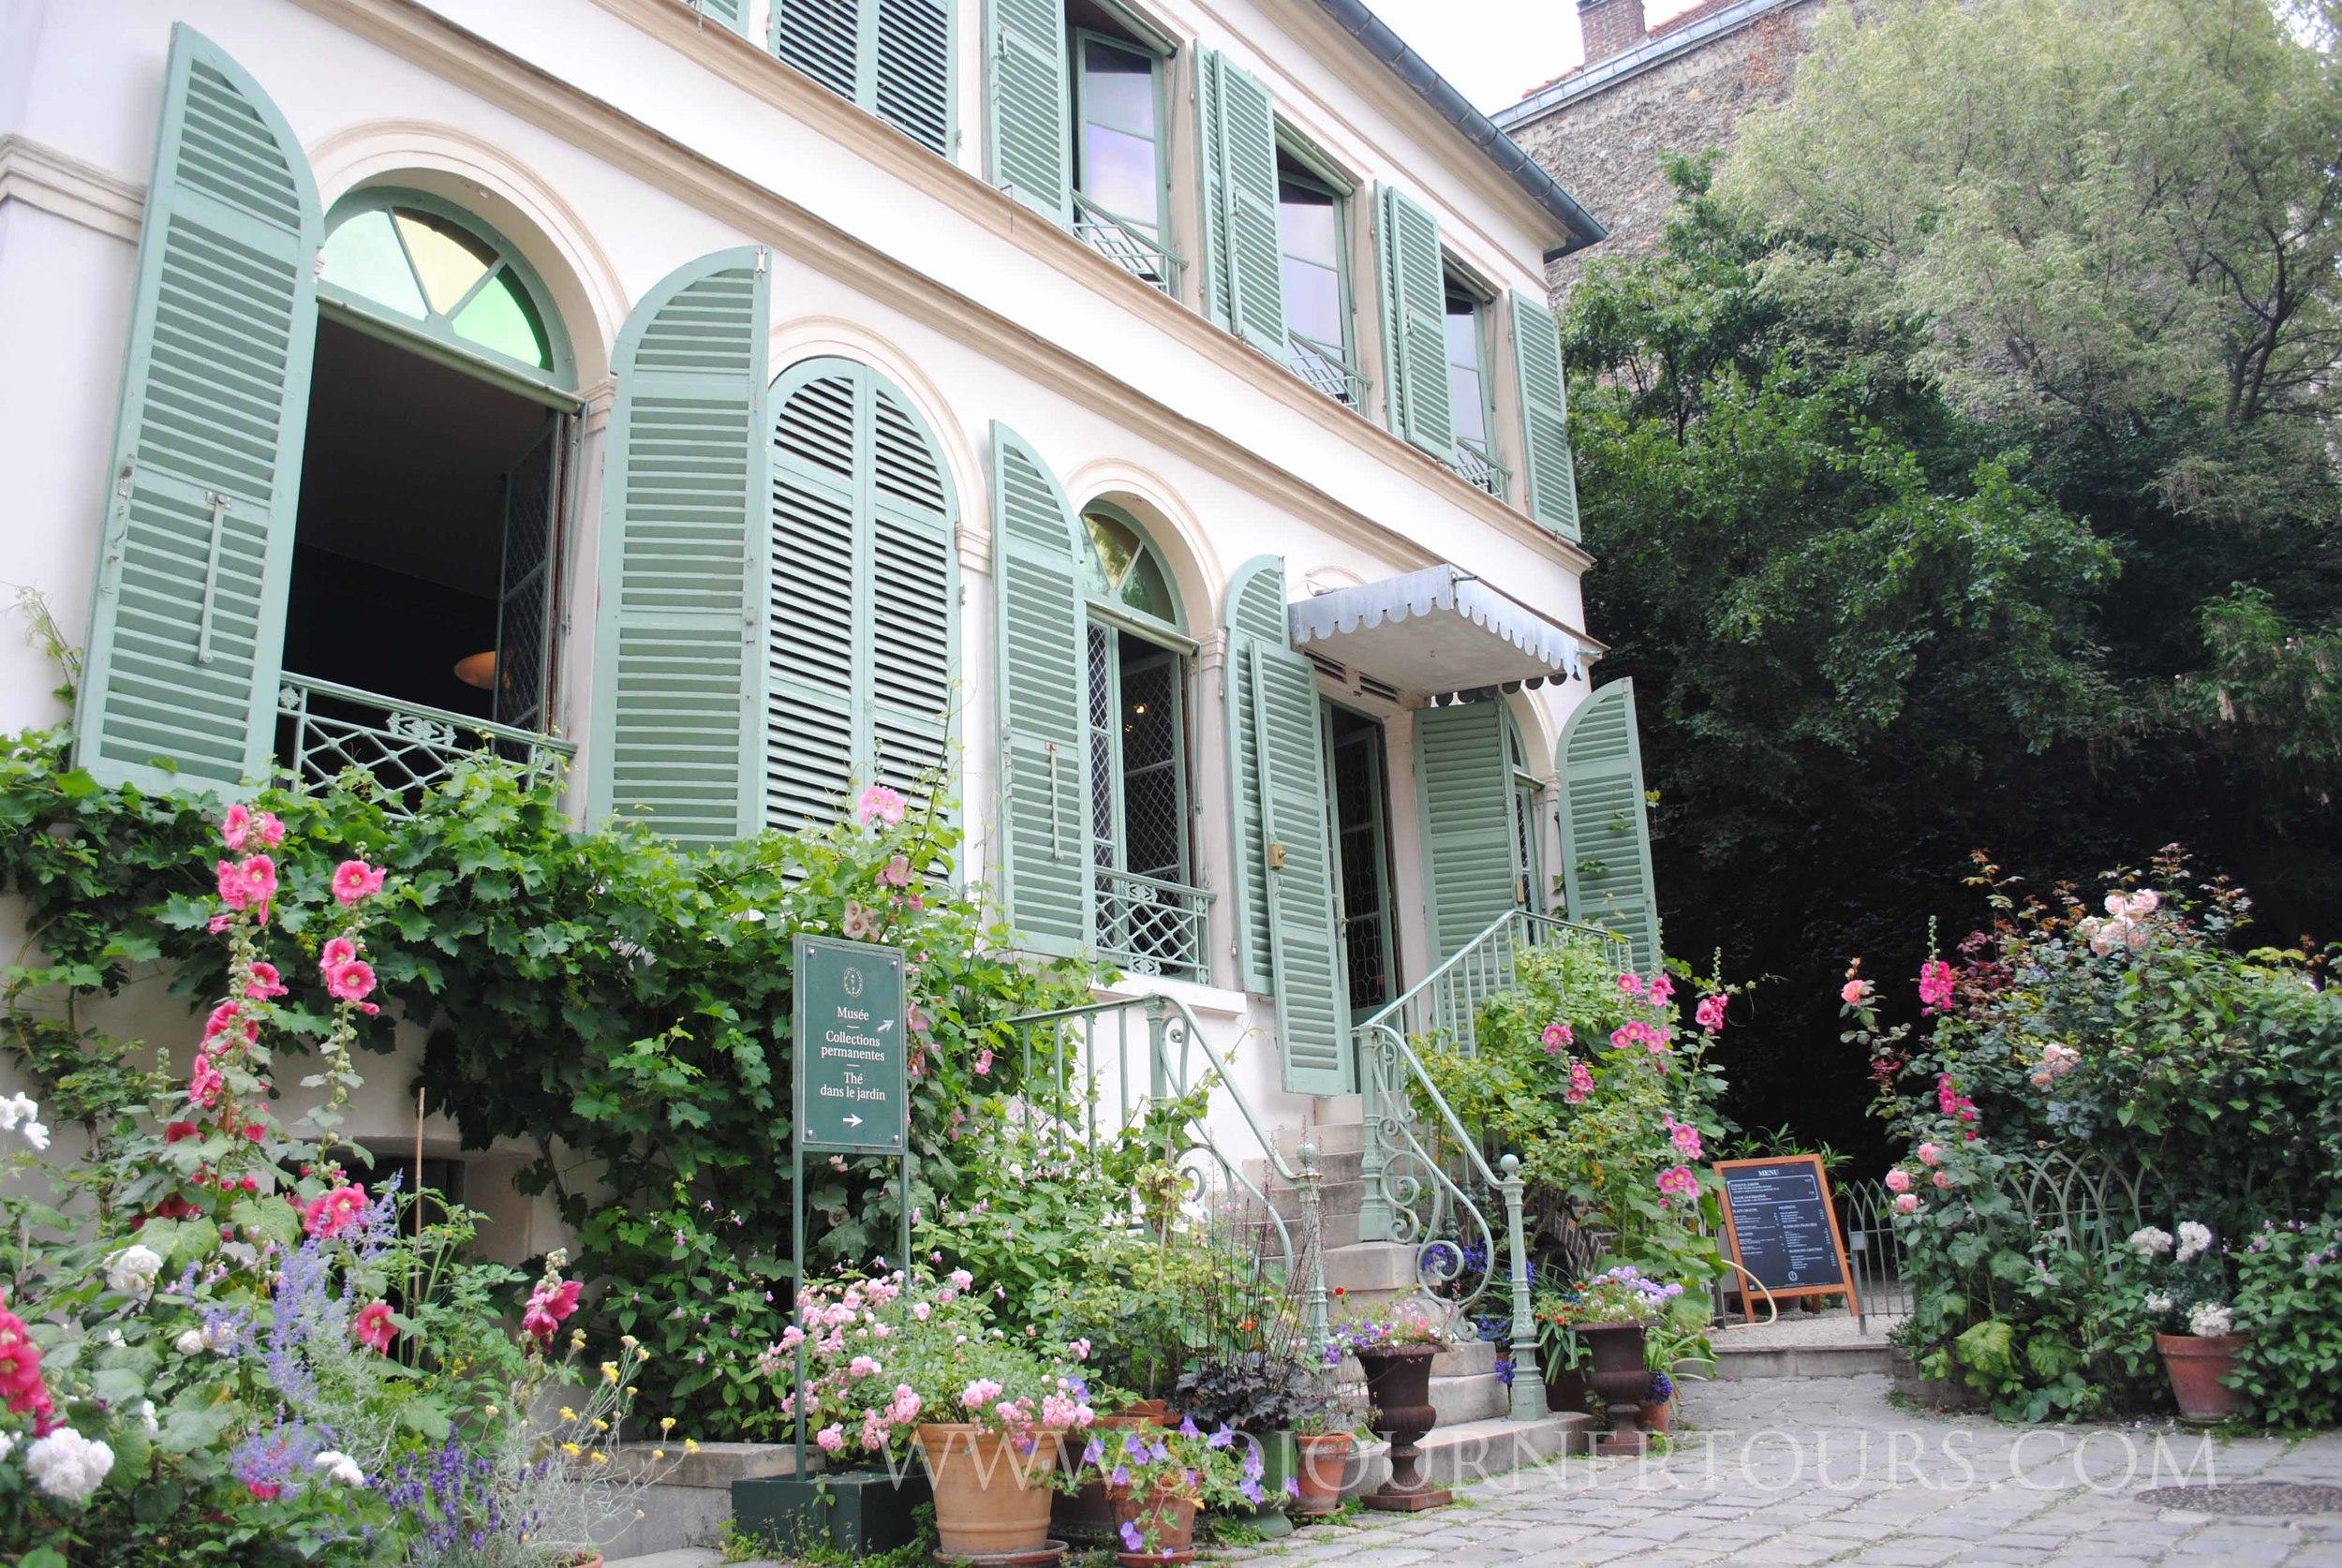 Museum of Romantic Life: Paris, France (Sojourner Tours)